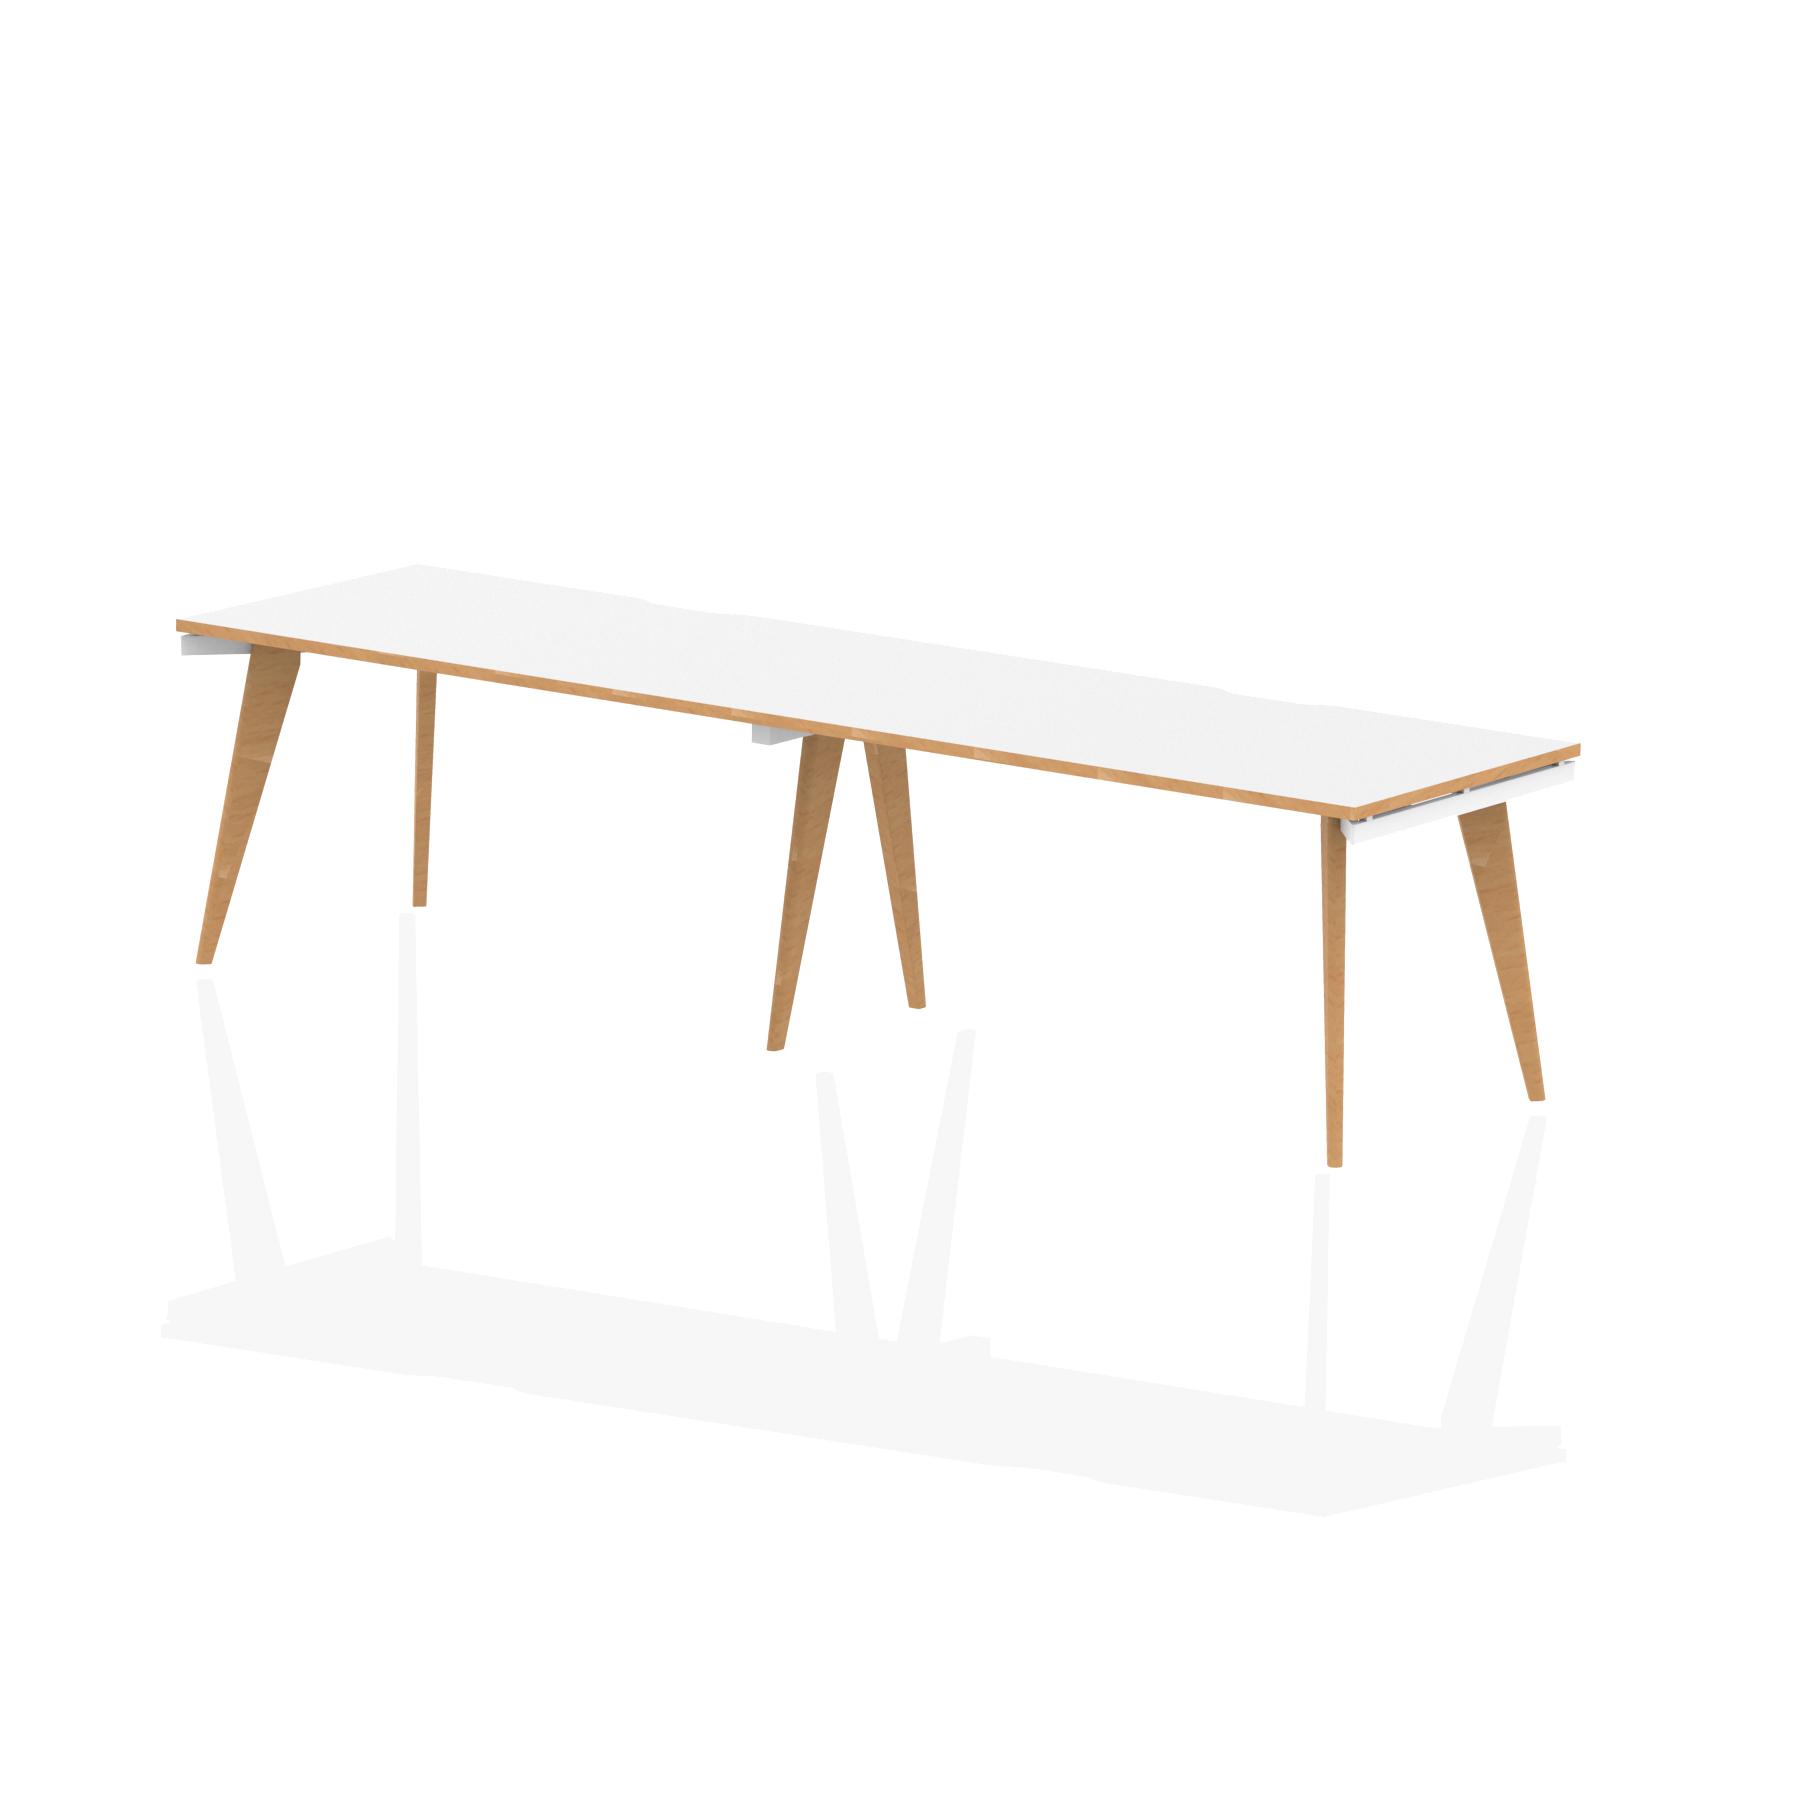 Oslo Single White Frame Wooden Leg Bench Desk 1400 White With Natural Wood Edge (2 Pod)